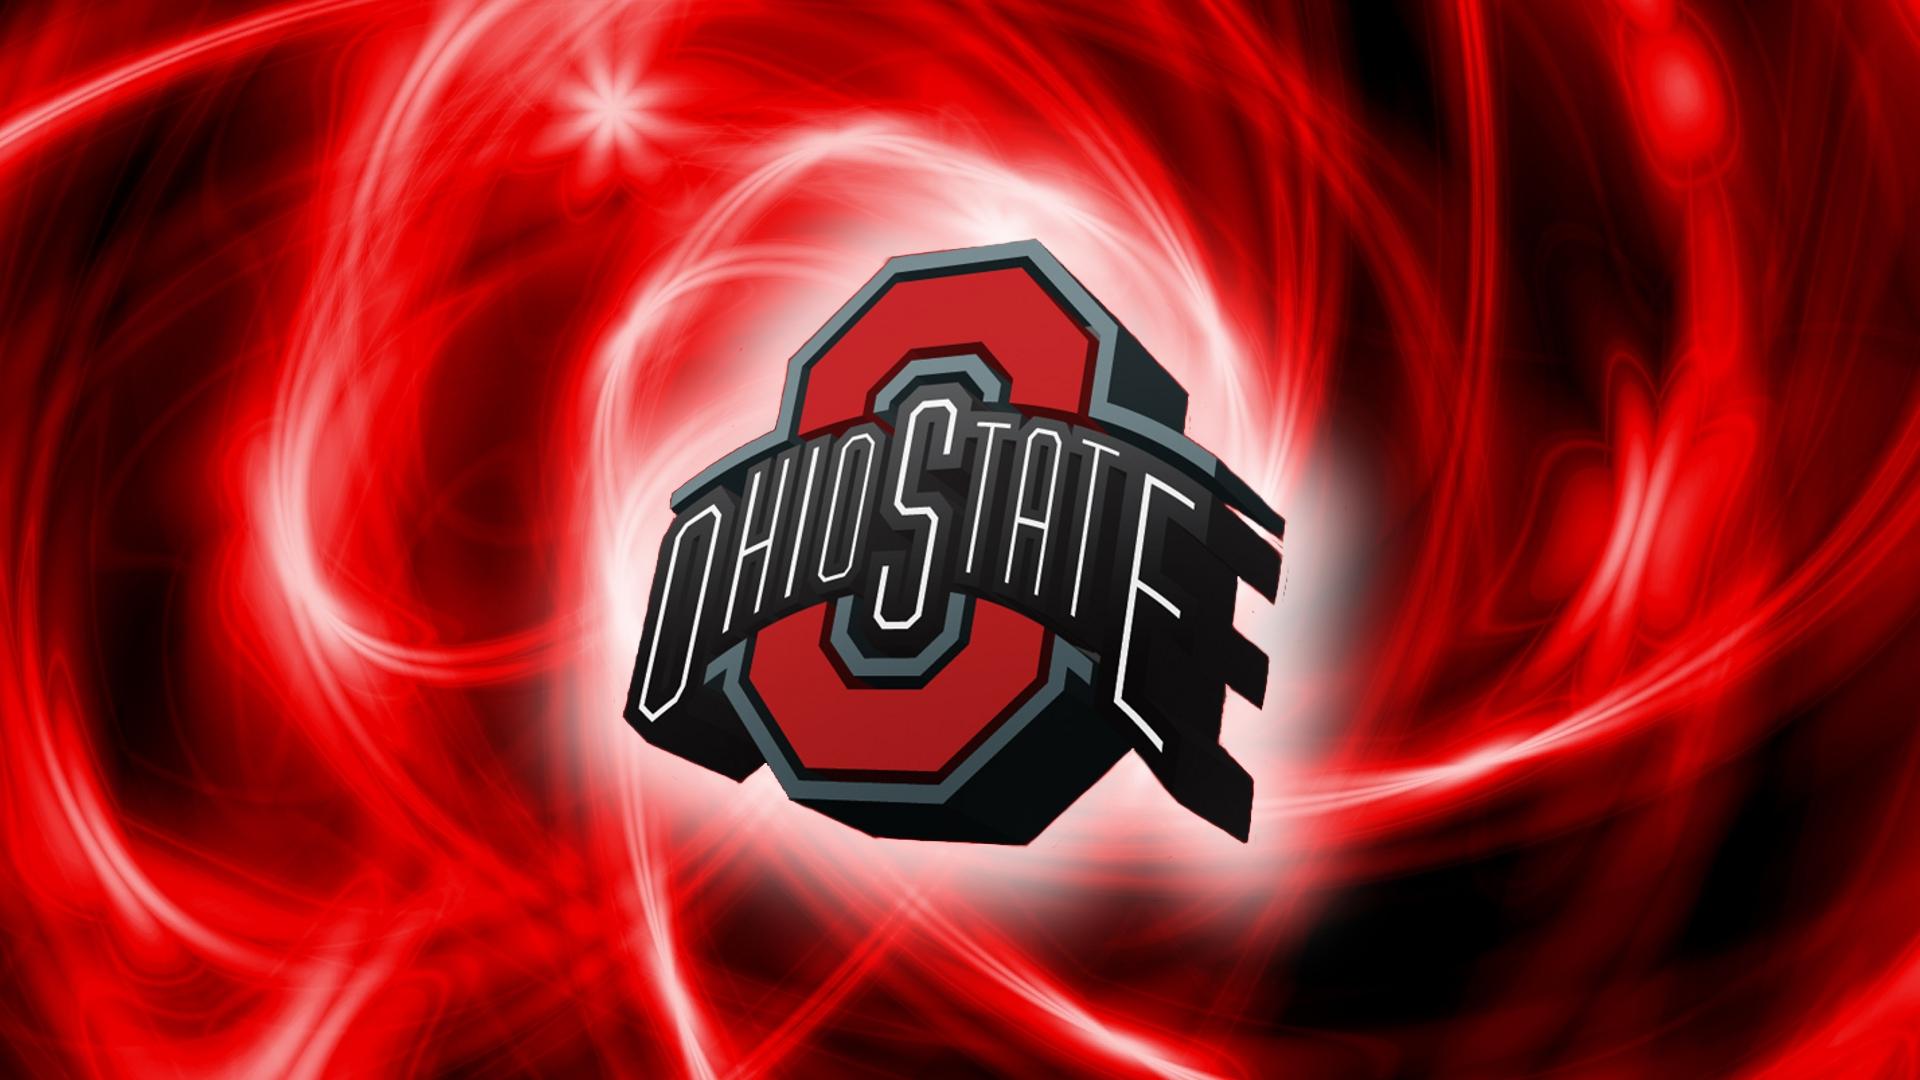 OSU Wallpaper 209 - Ohio State Football Wallpaper (29088652) - Fanpop